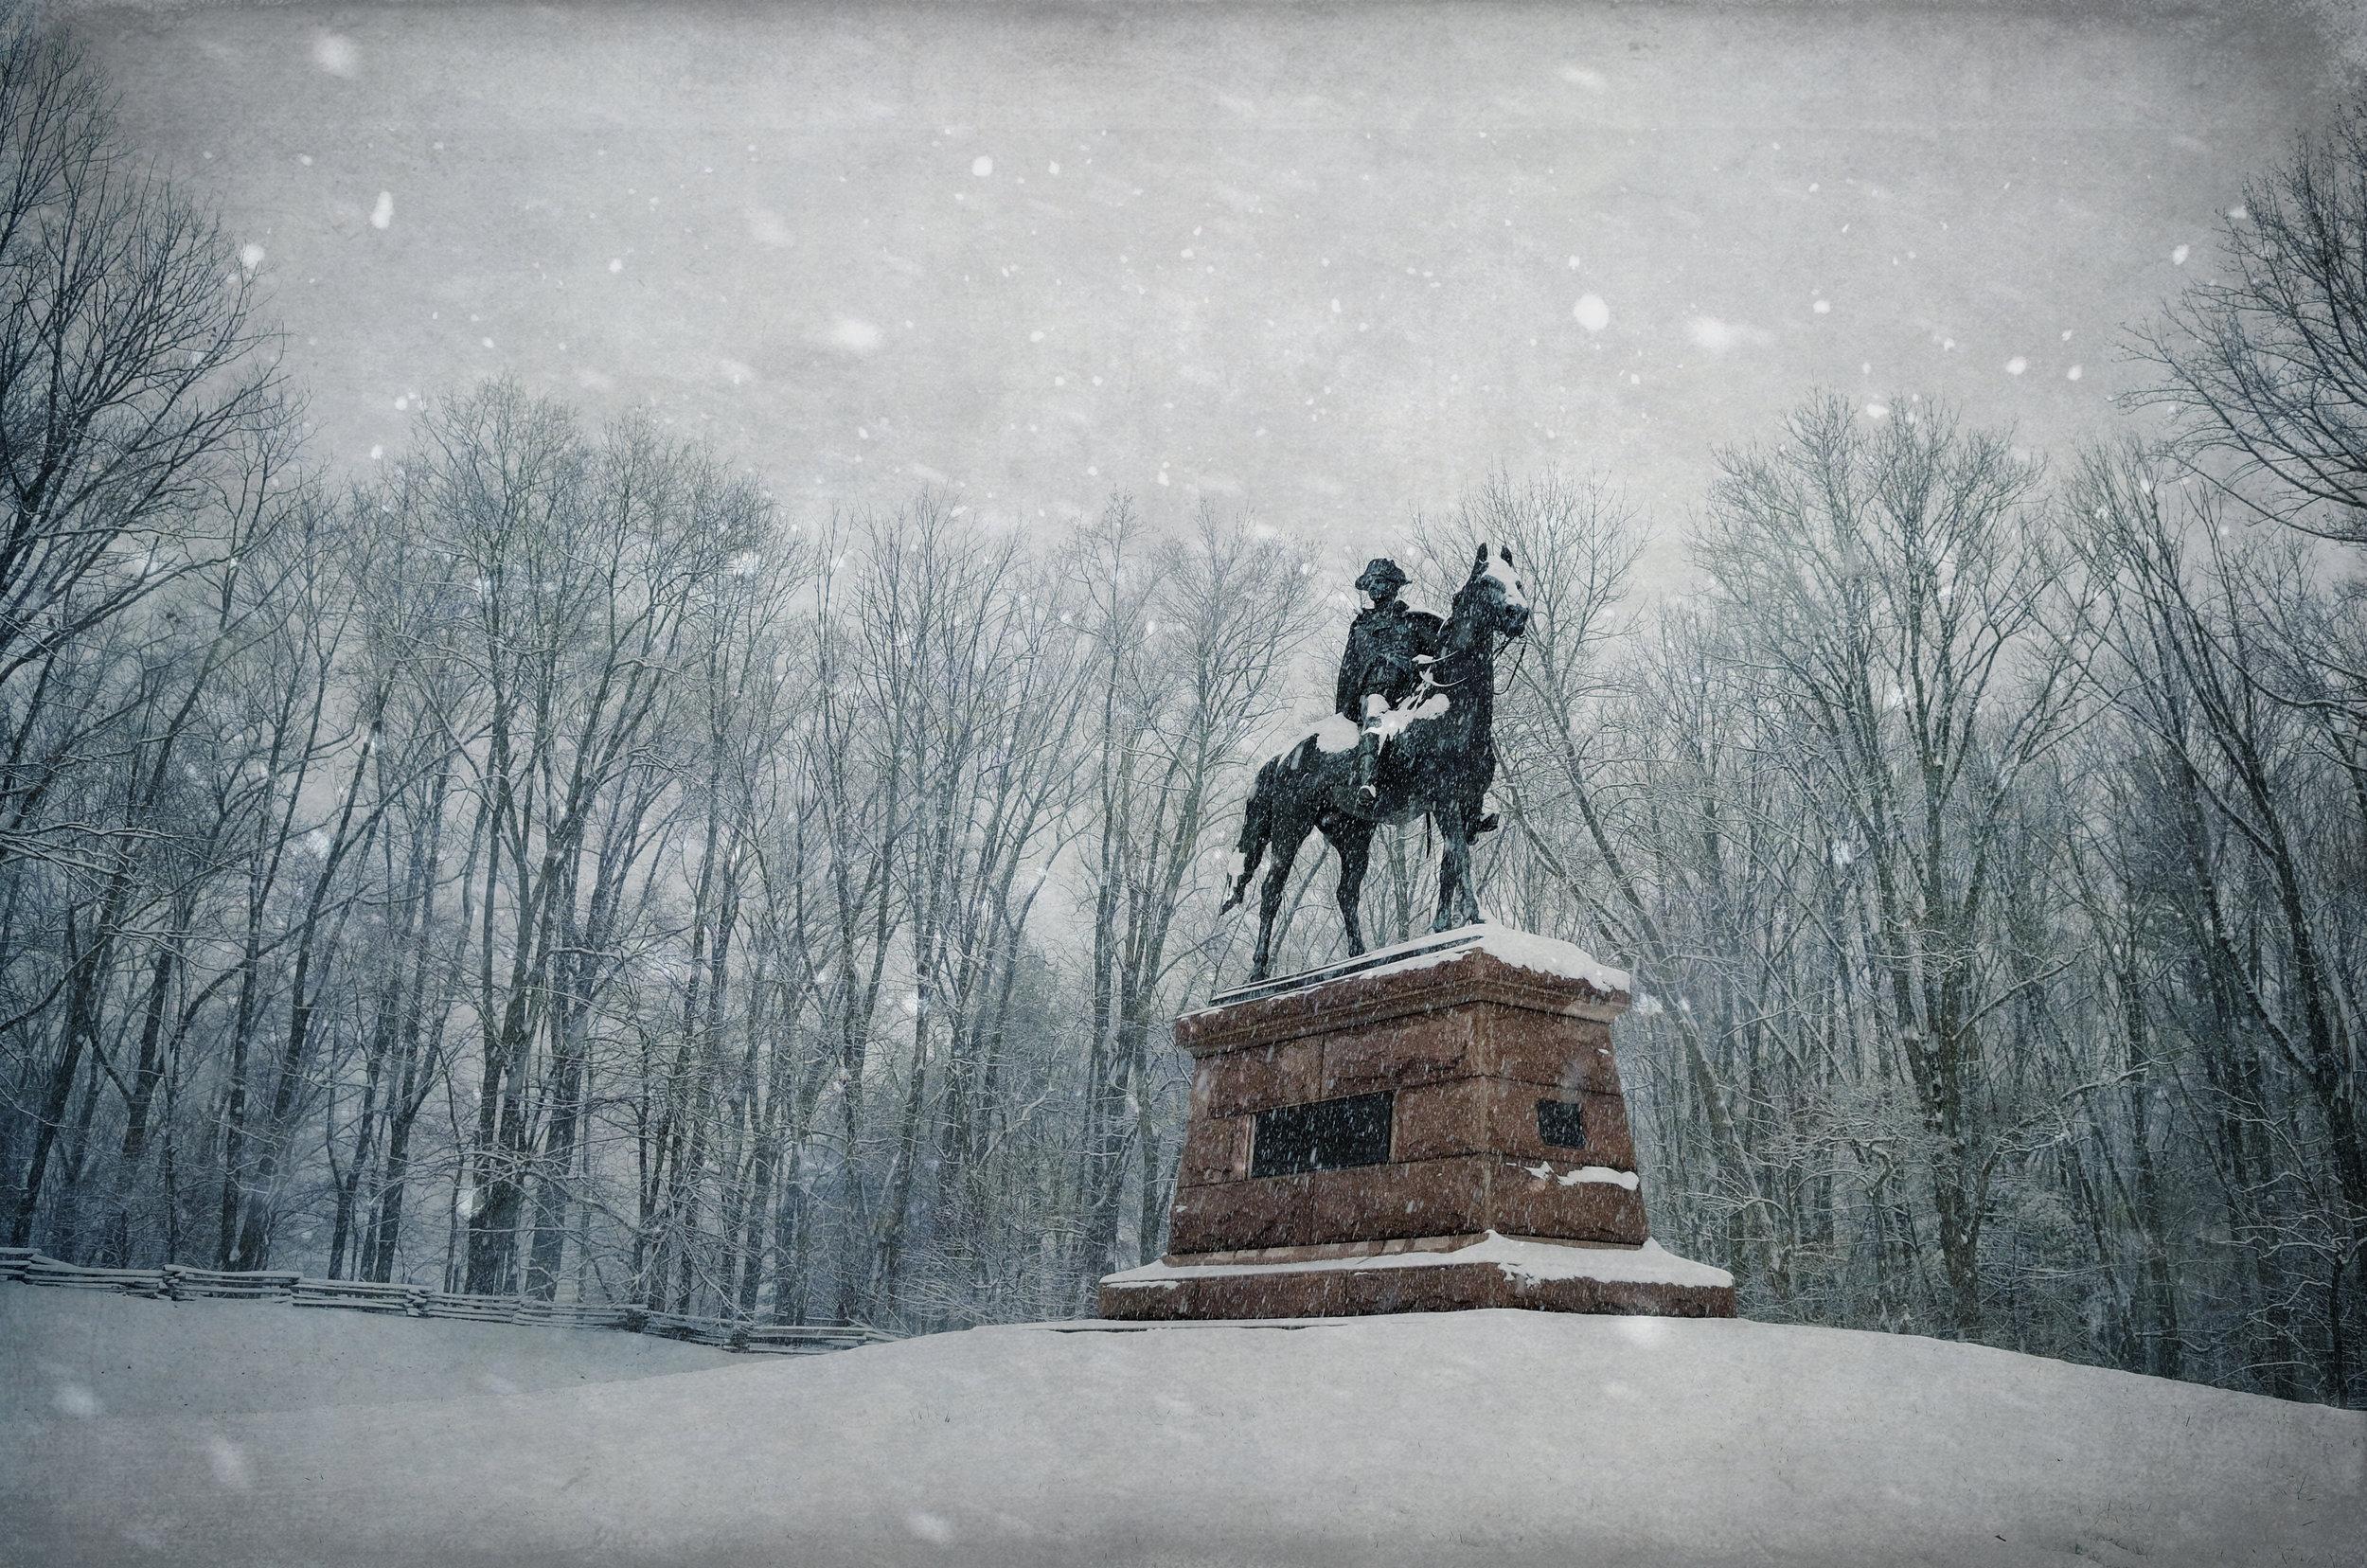 mjt042 - SnowingOnMadAnthony.jpg